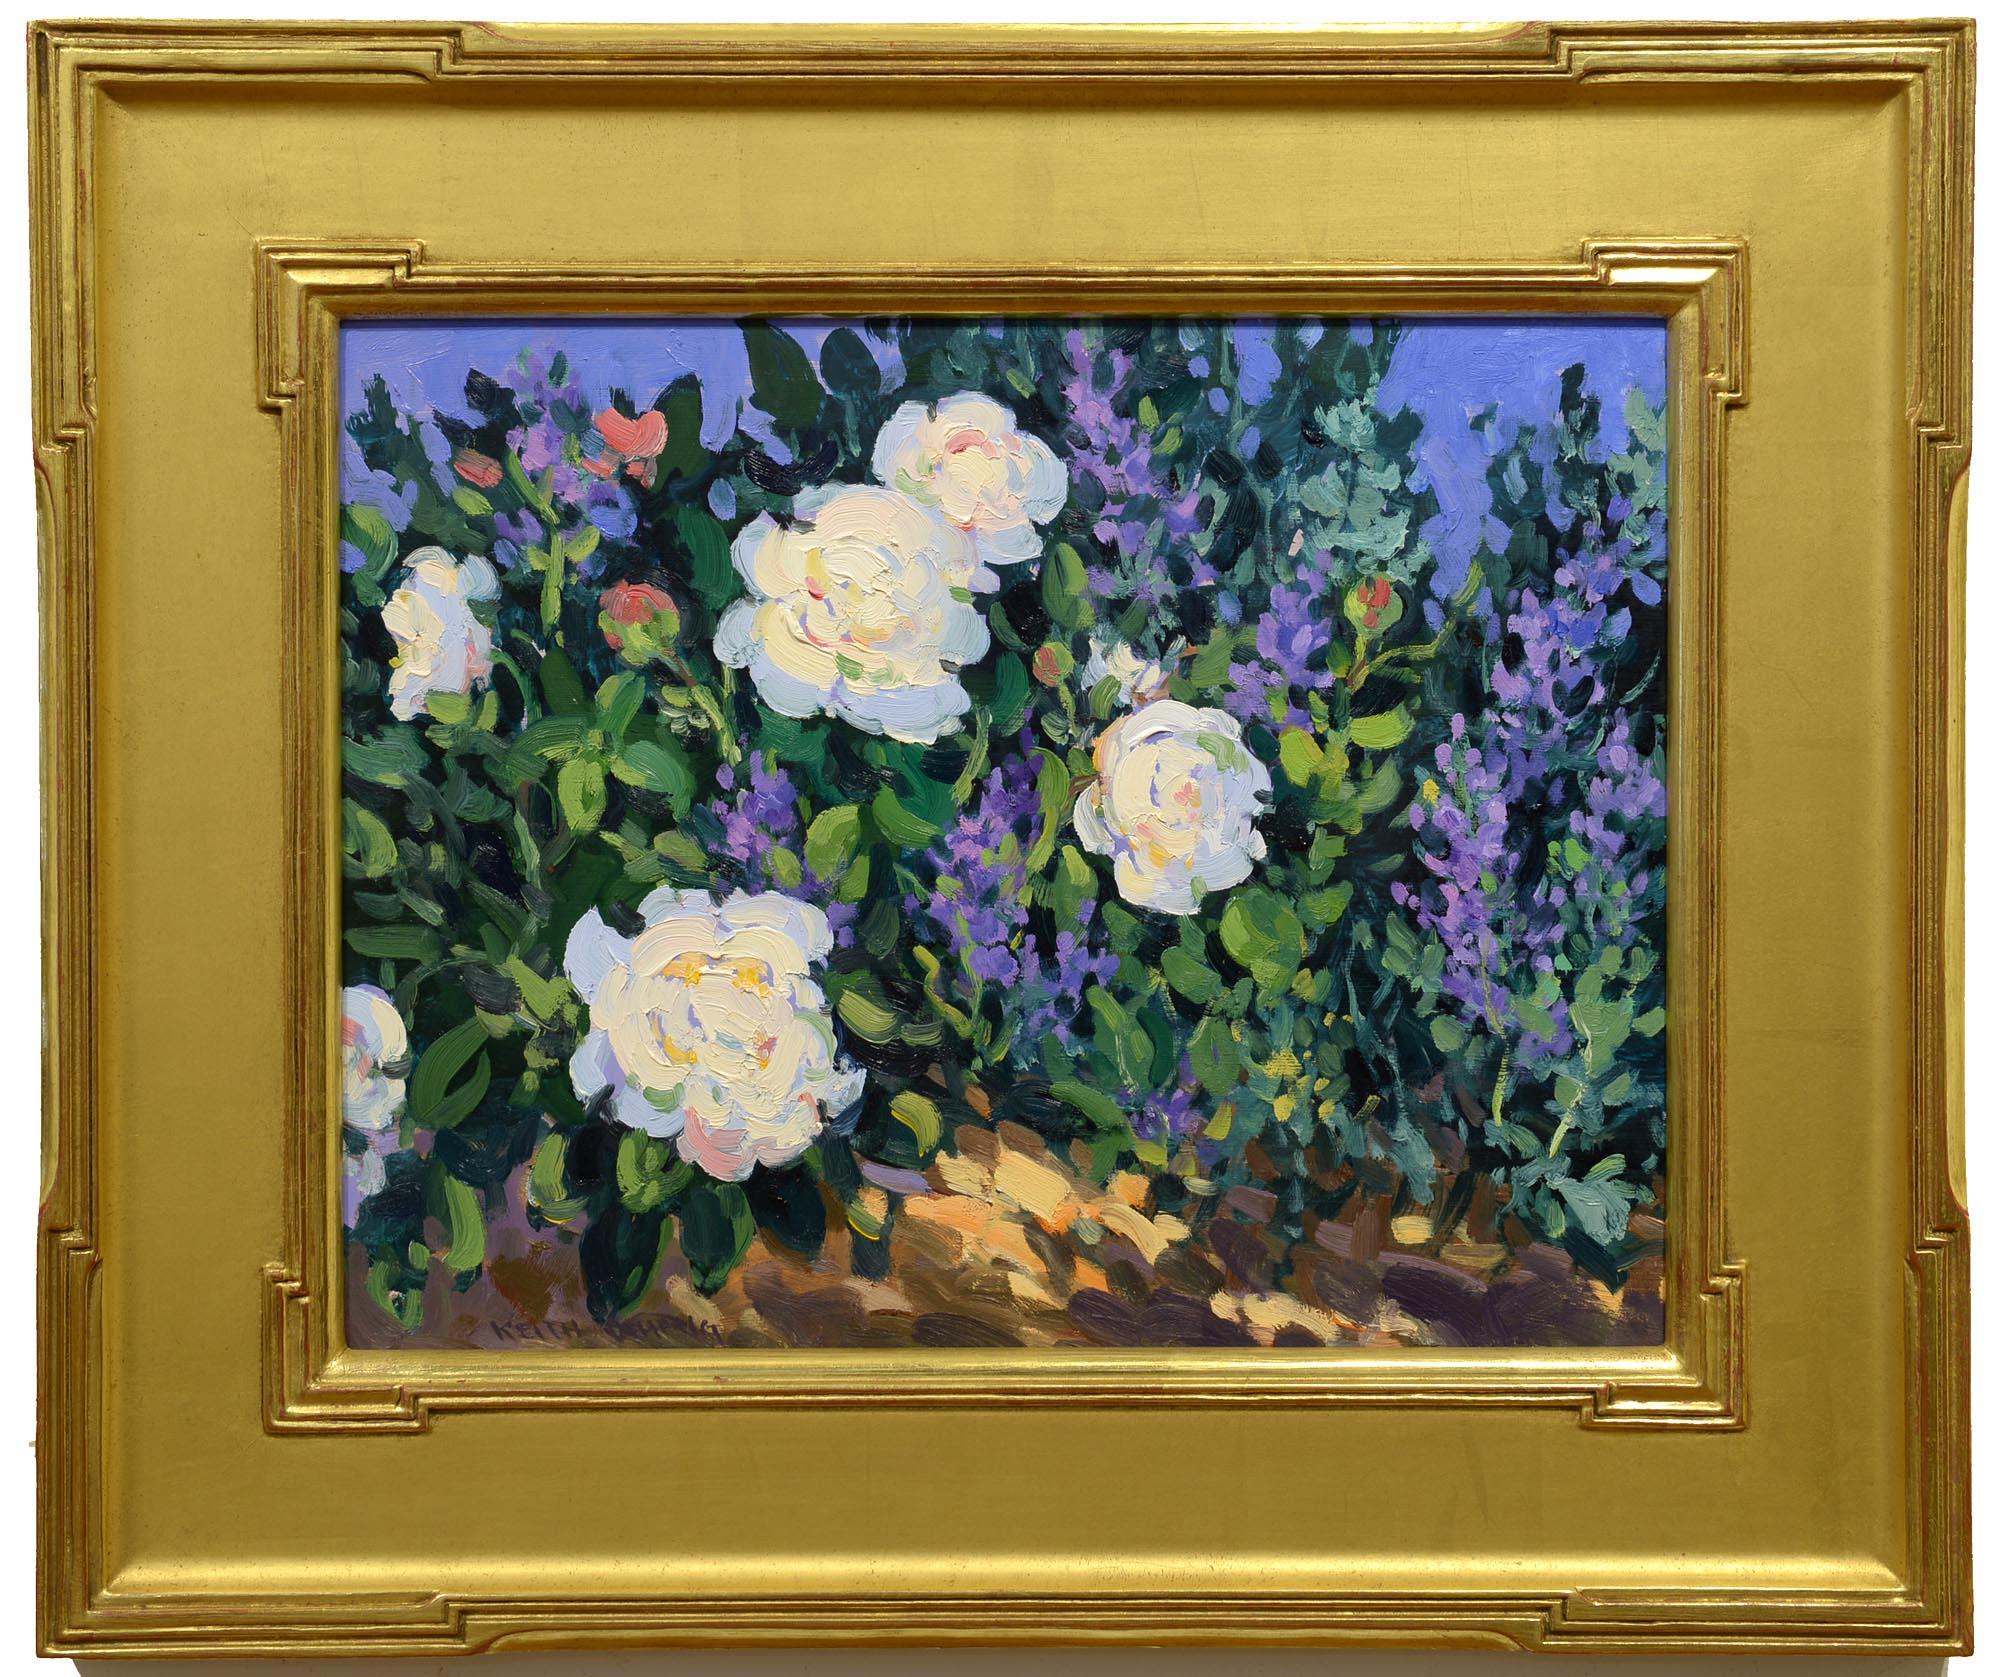 Keith Oehmig Garden Peonies framed